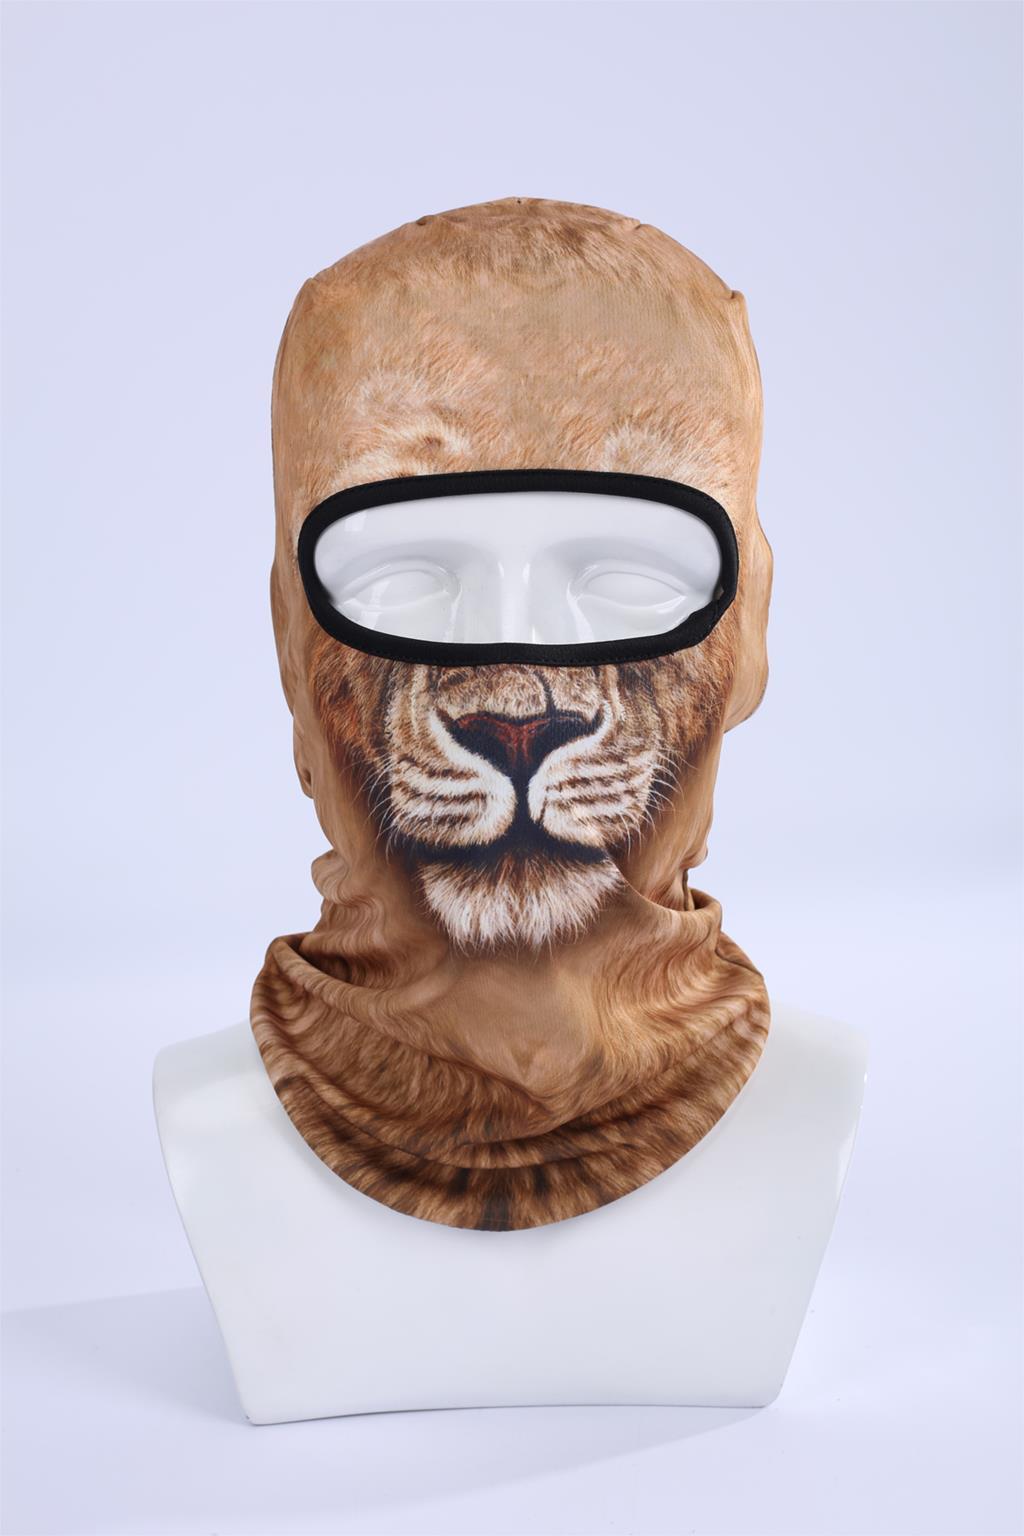 Full face mask neck warmer hood balaclava outdoor winter sports hats - 2017 Winter Hat Hot Sale Cool 3d Animal Ski Hood Veil Balaclava Full Face Mask